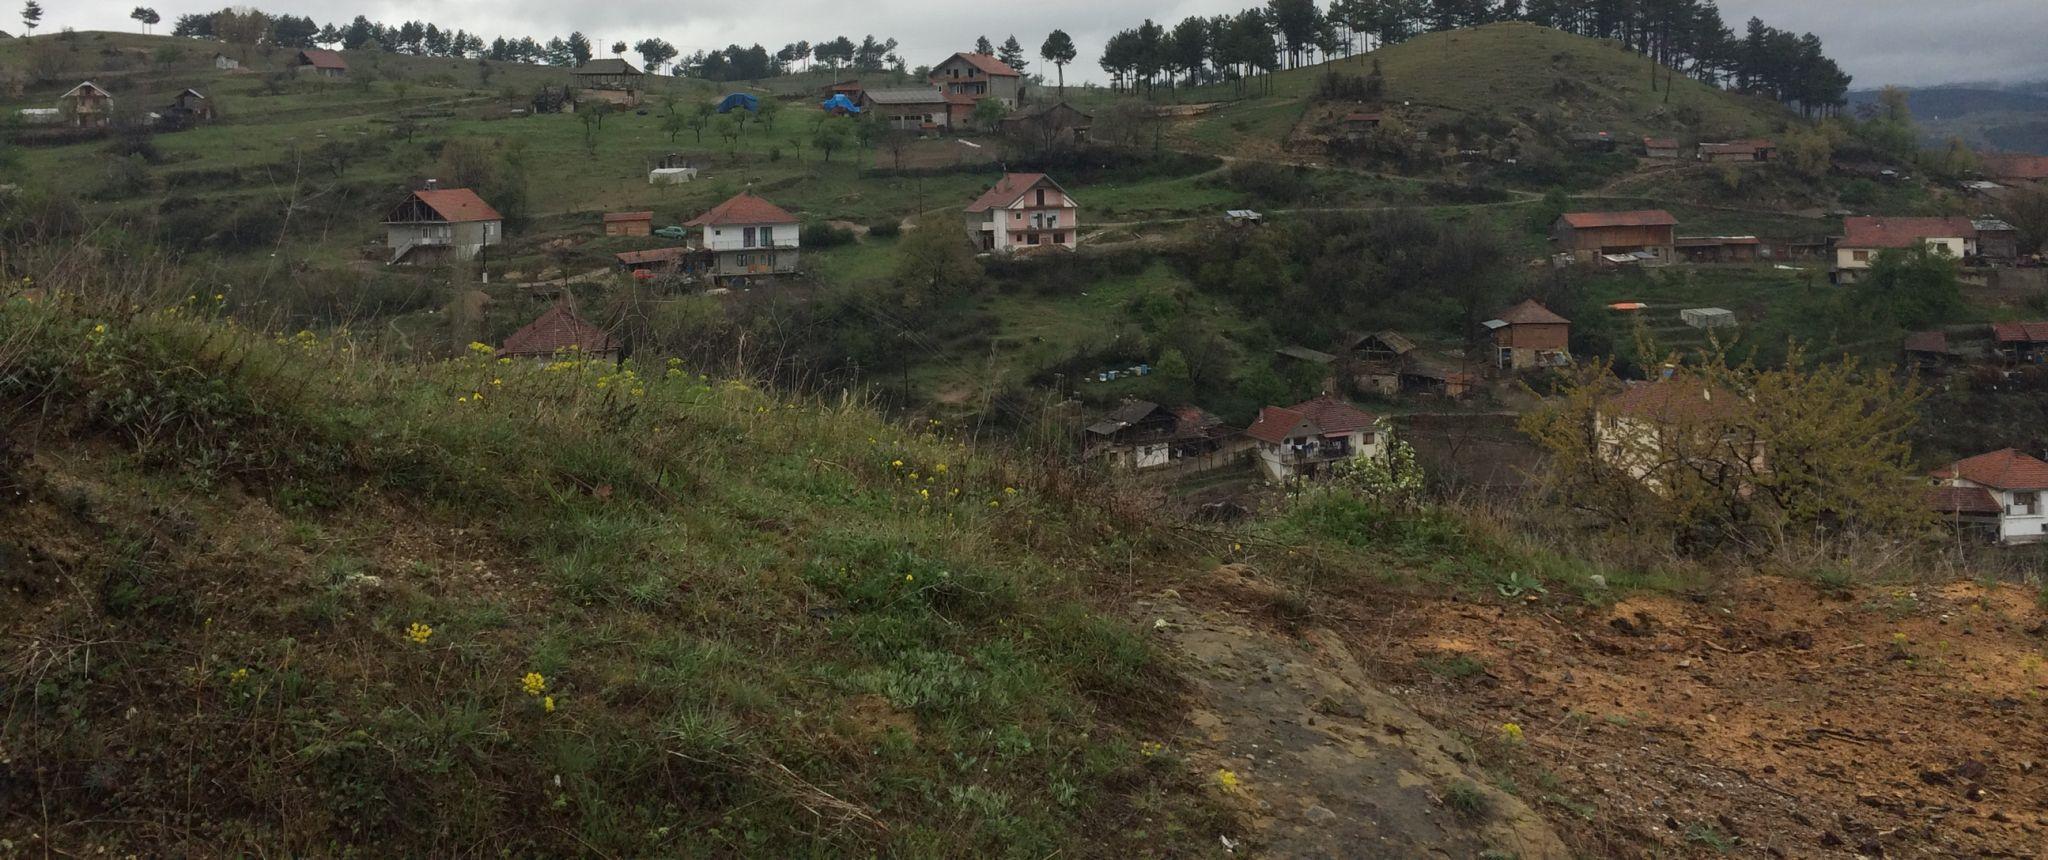 IMG 0356 - Macedonian landscapes